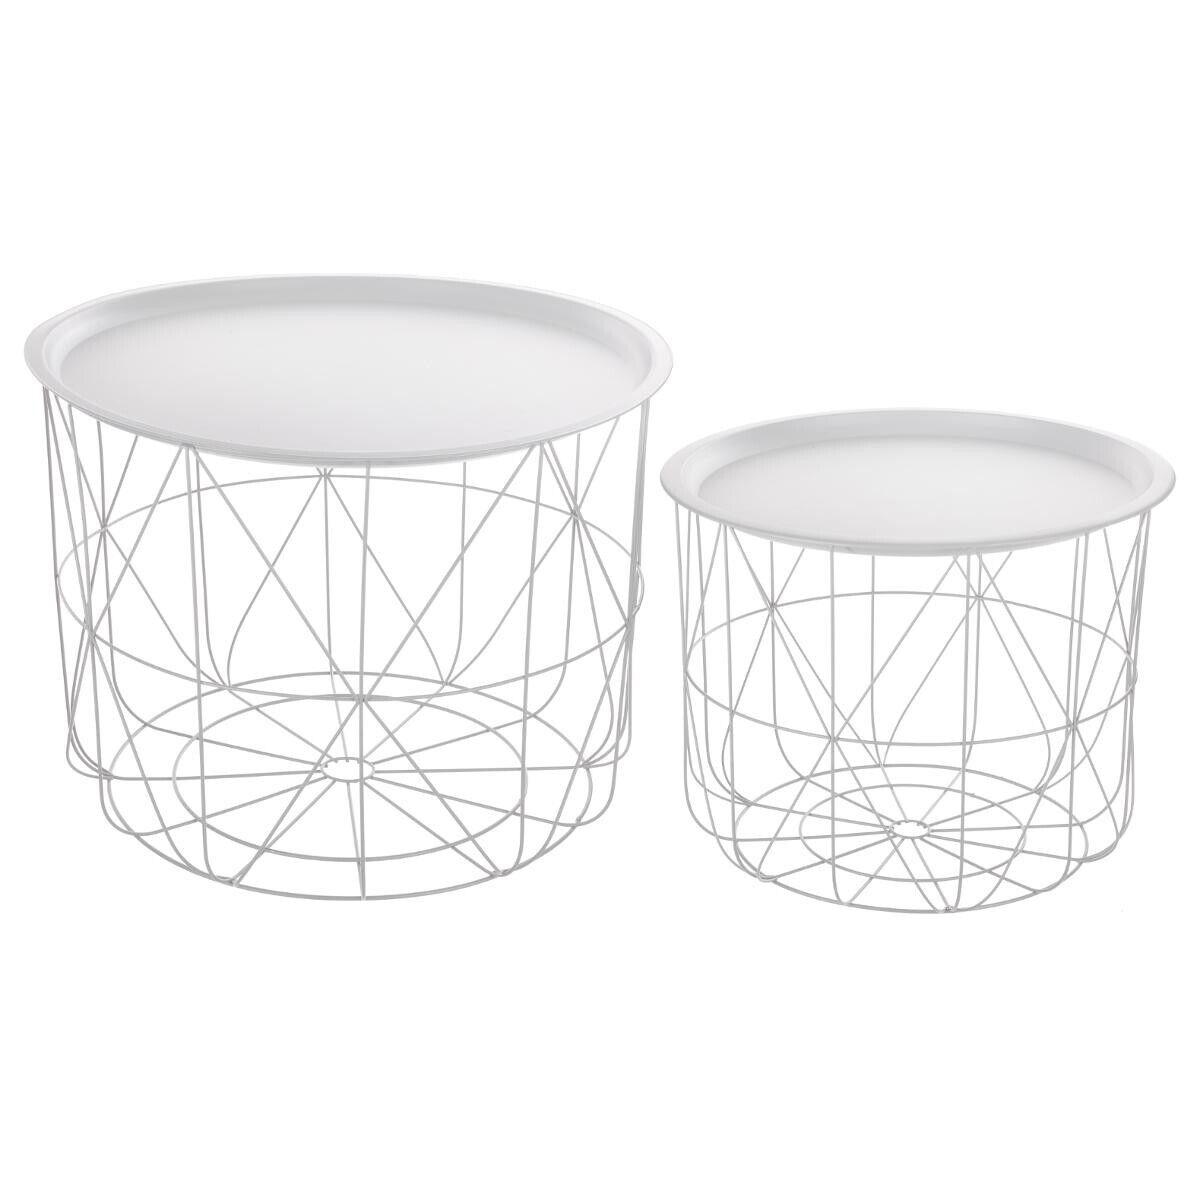 "Atmosphera Table à café blanche ""Matt"" en métal"